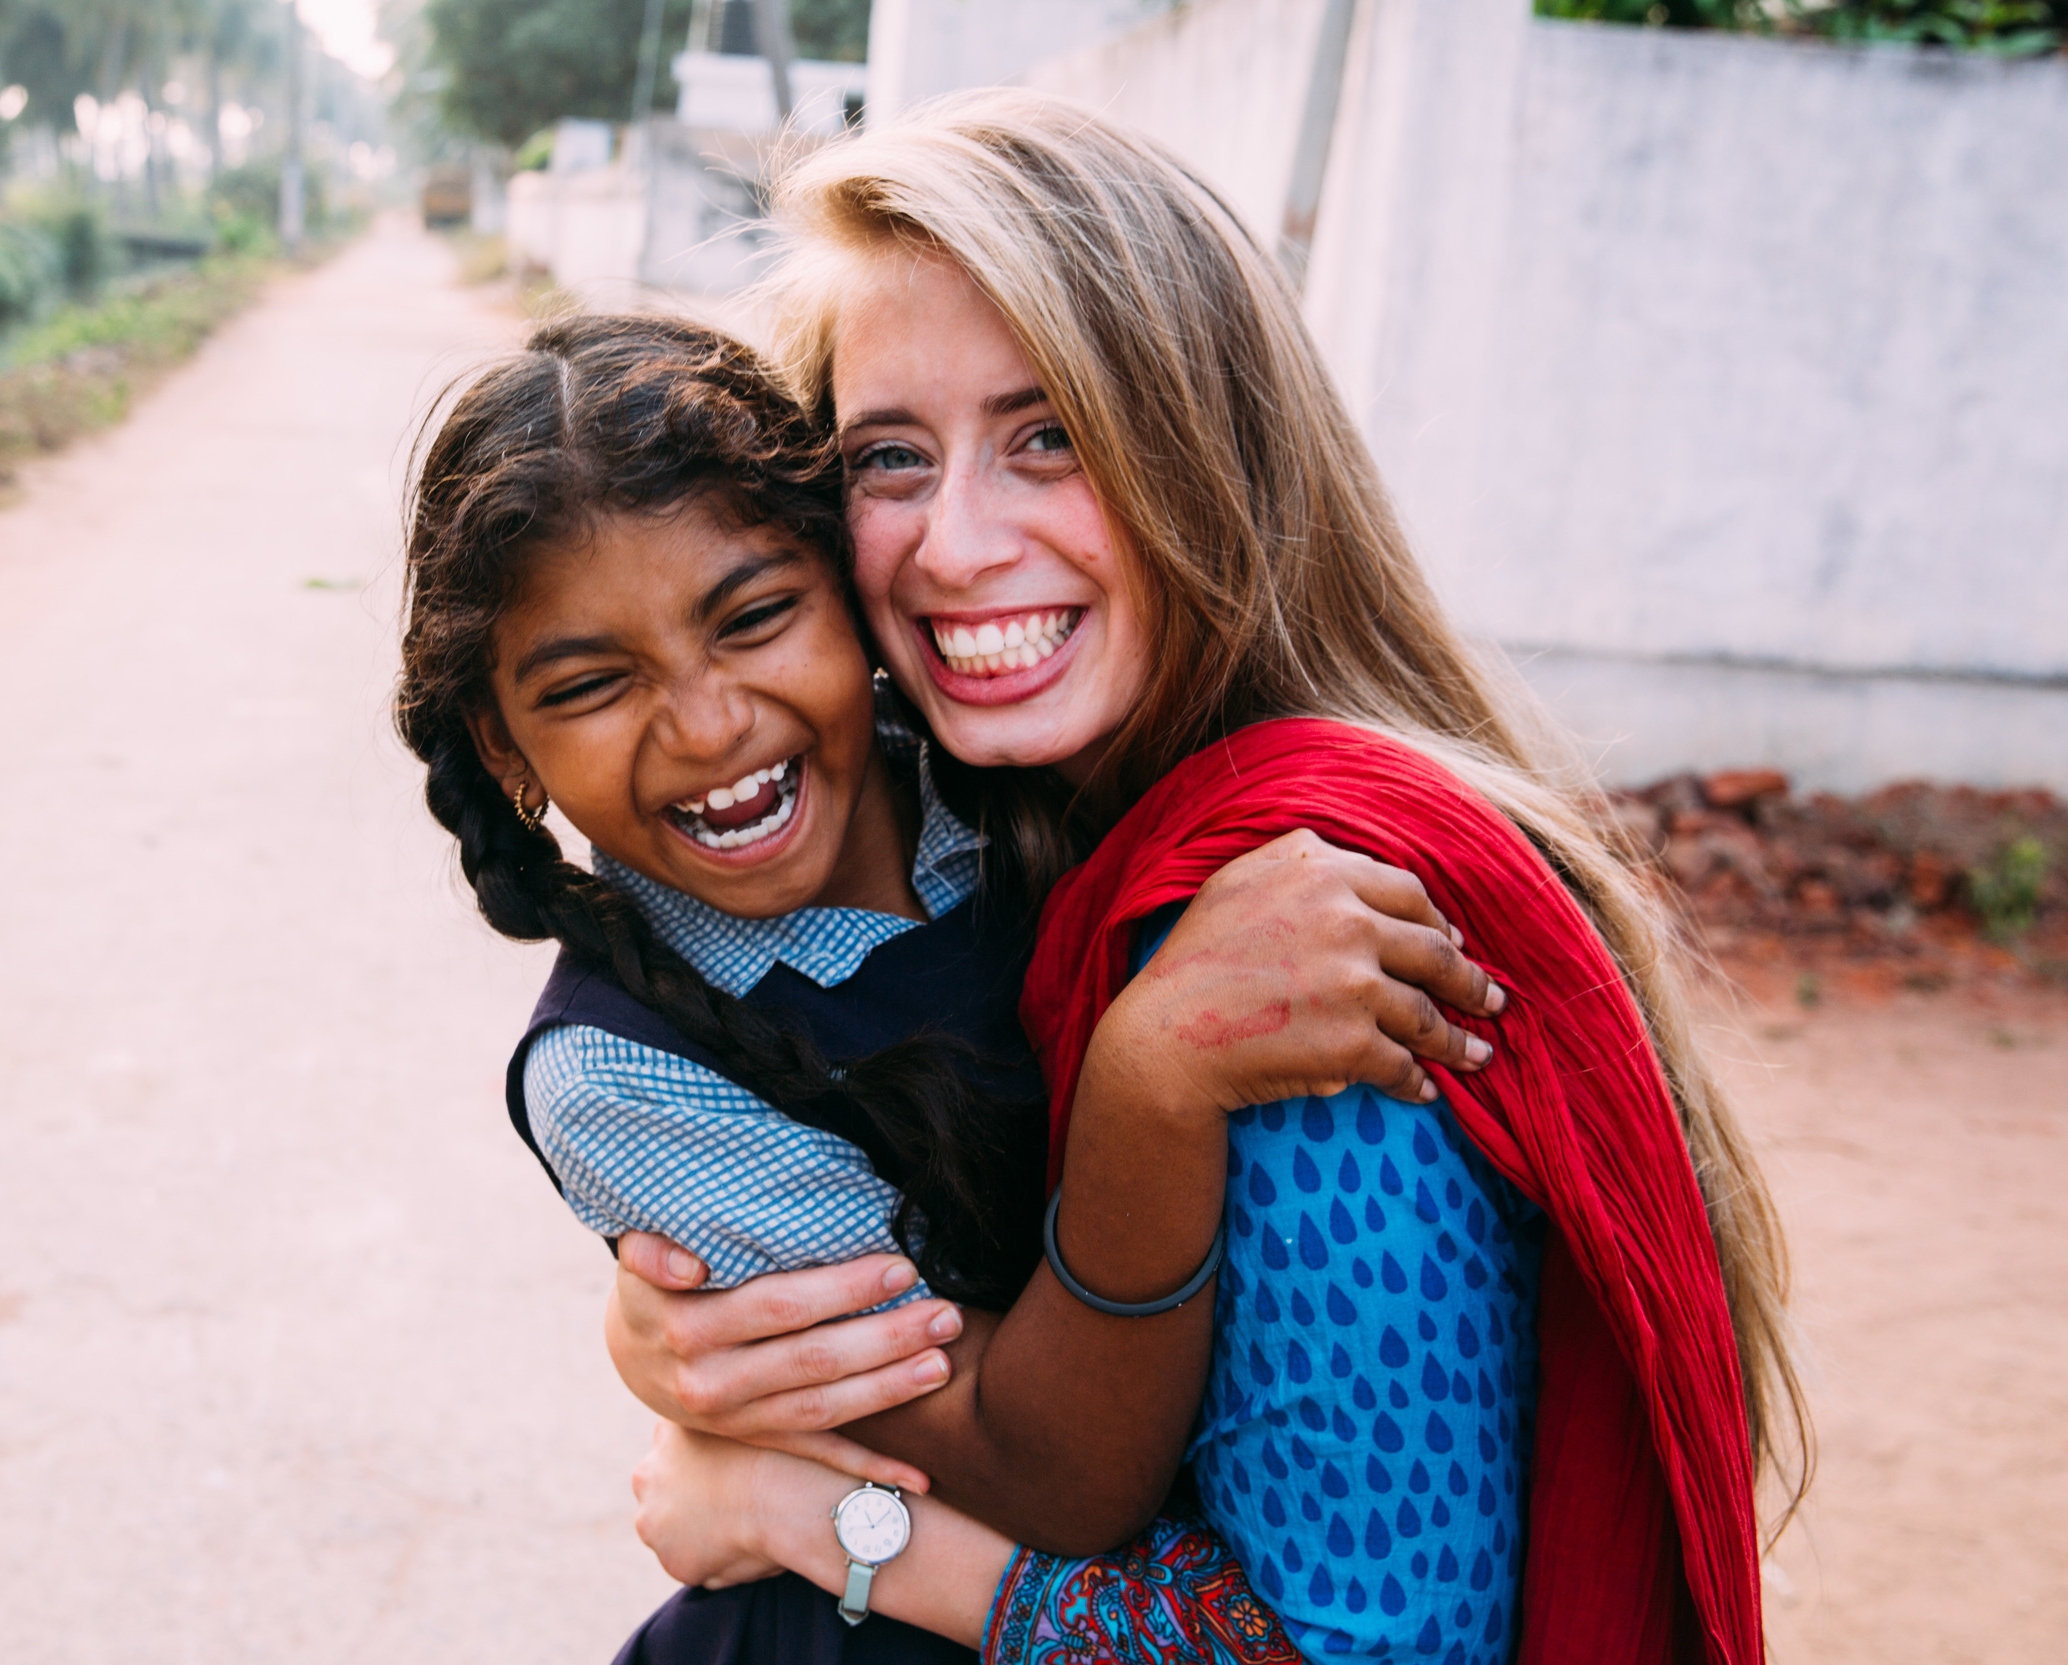 Rachel with Bala in India